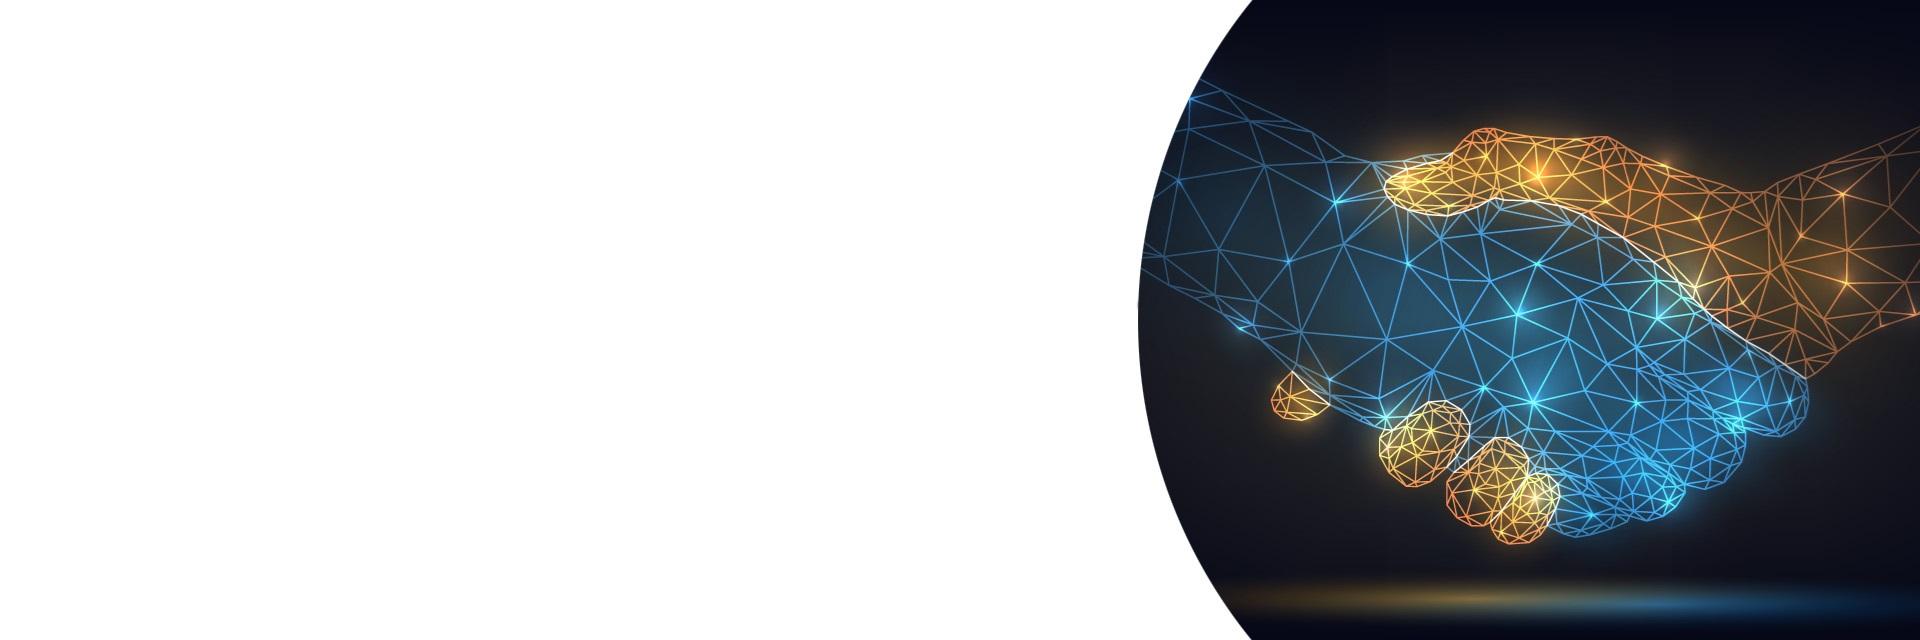 Digitala-trender-2021_Hero_3-1_2.jpg